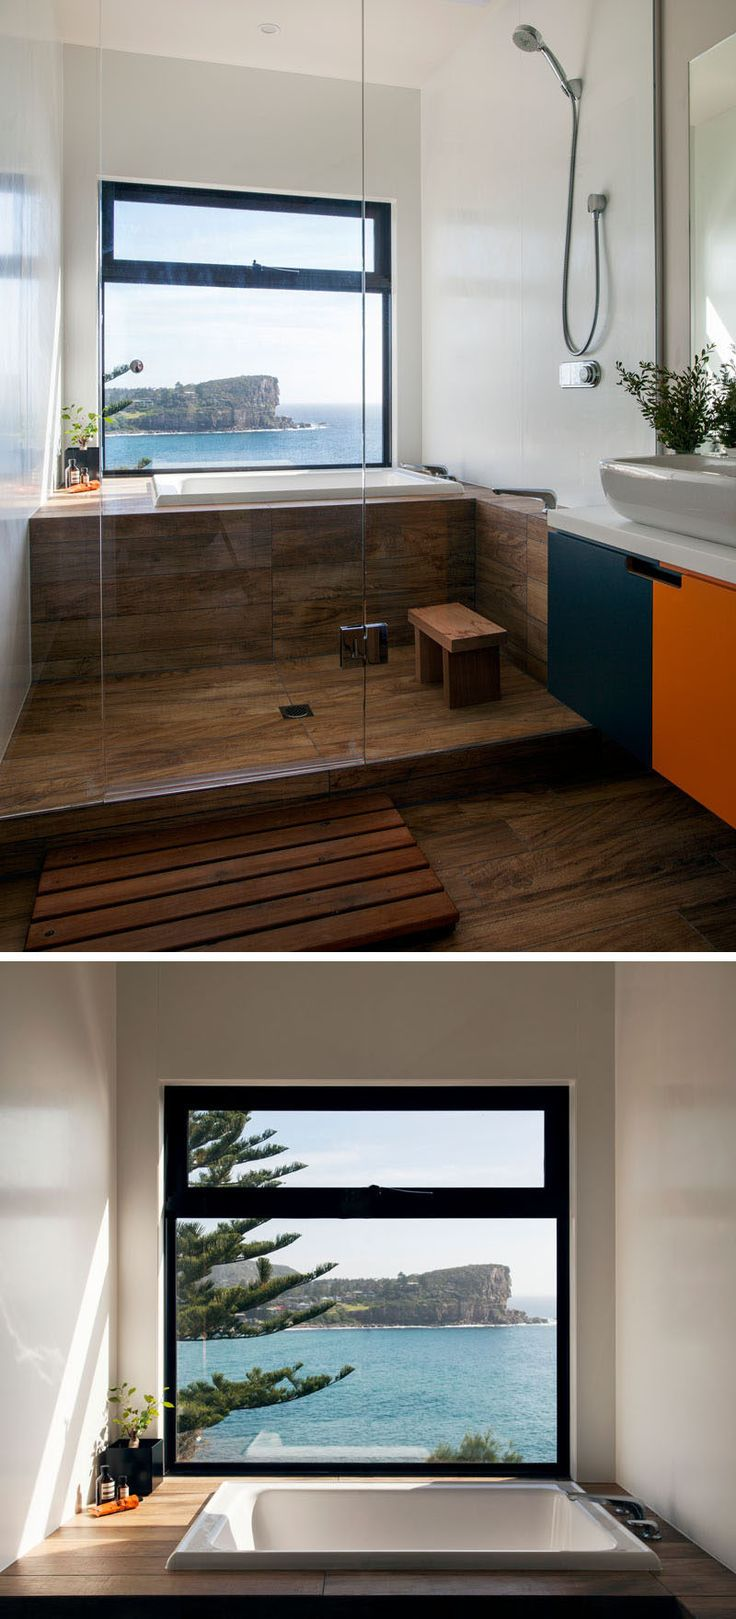 Bathroom Design Idea - Create a Spa-Like Bathroom At Home // Include a luxurious deep soaker tub.